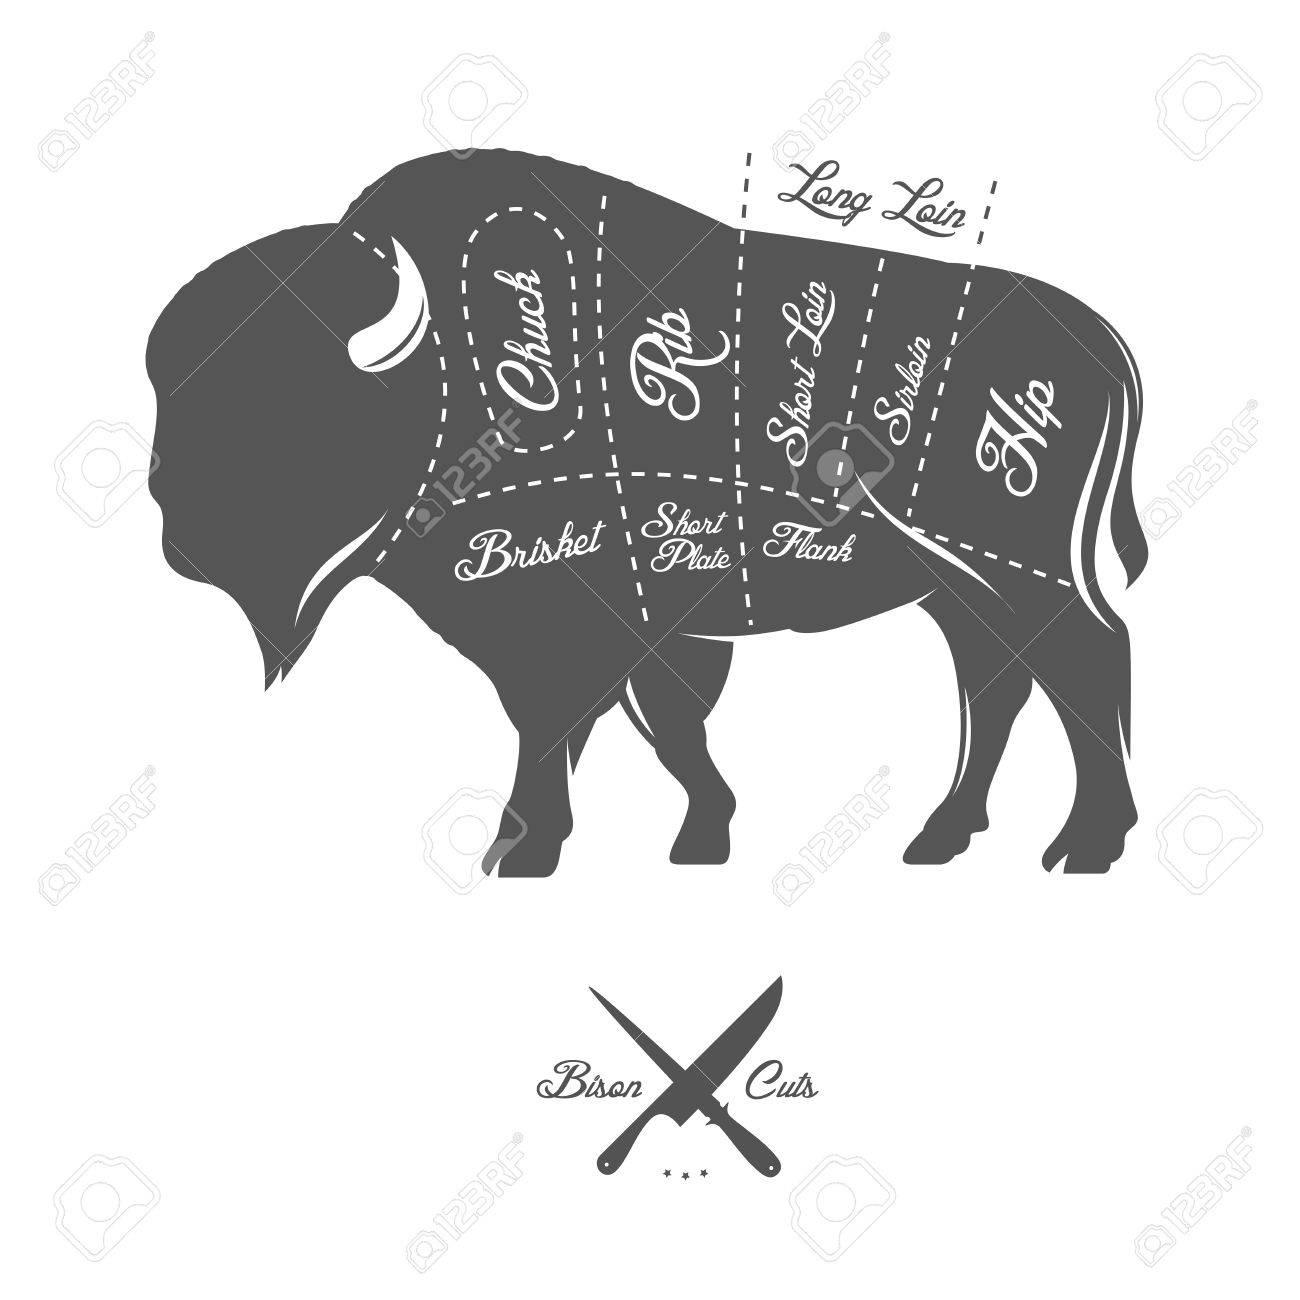 Vintage Butcher Cuts Of Bison Buffalo Scheme Diagram Royalty Free ...